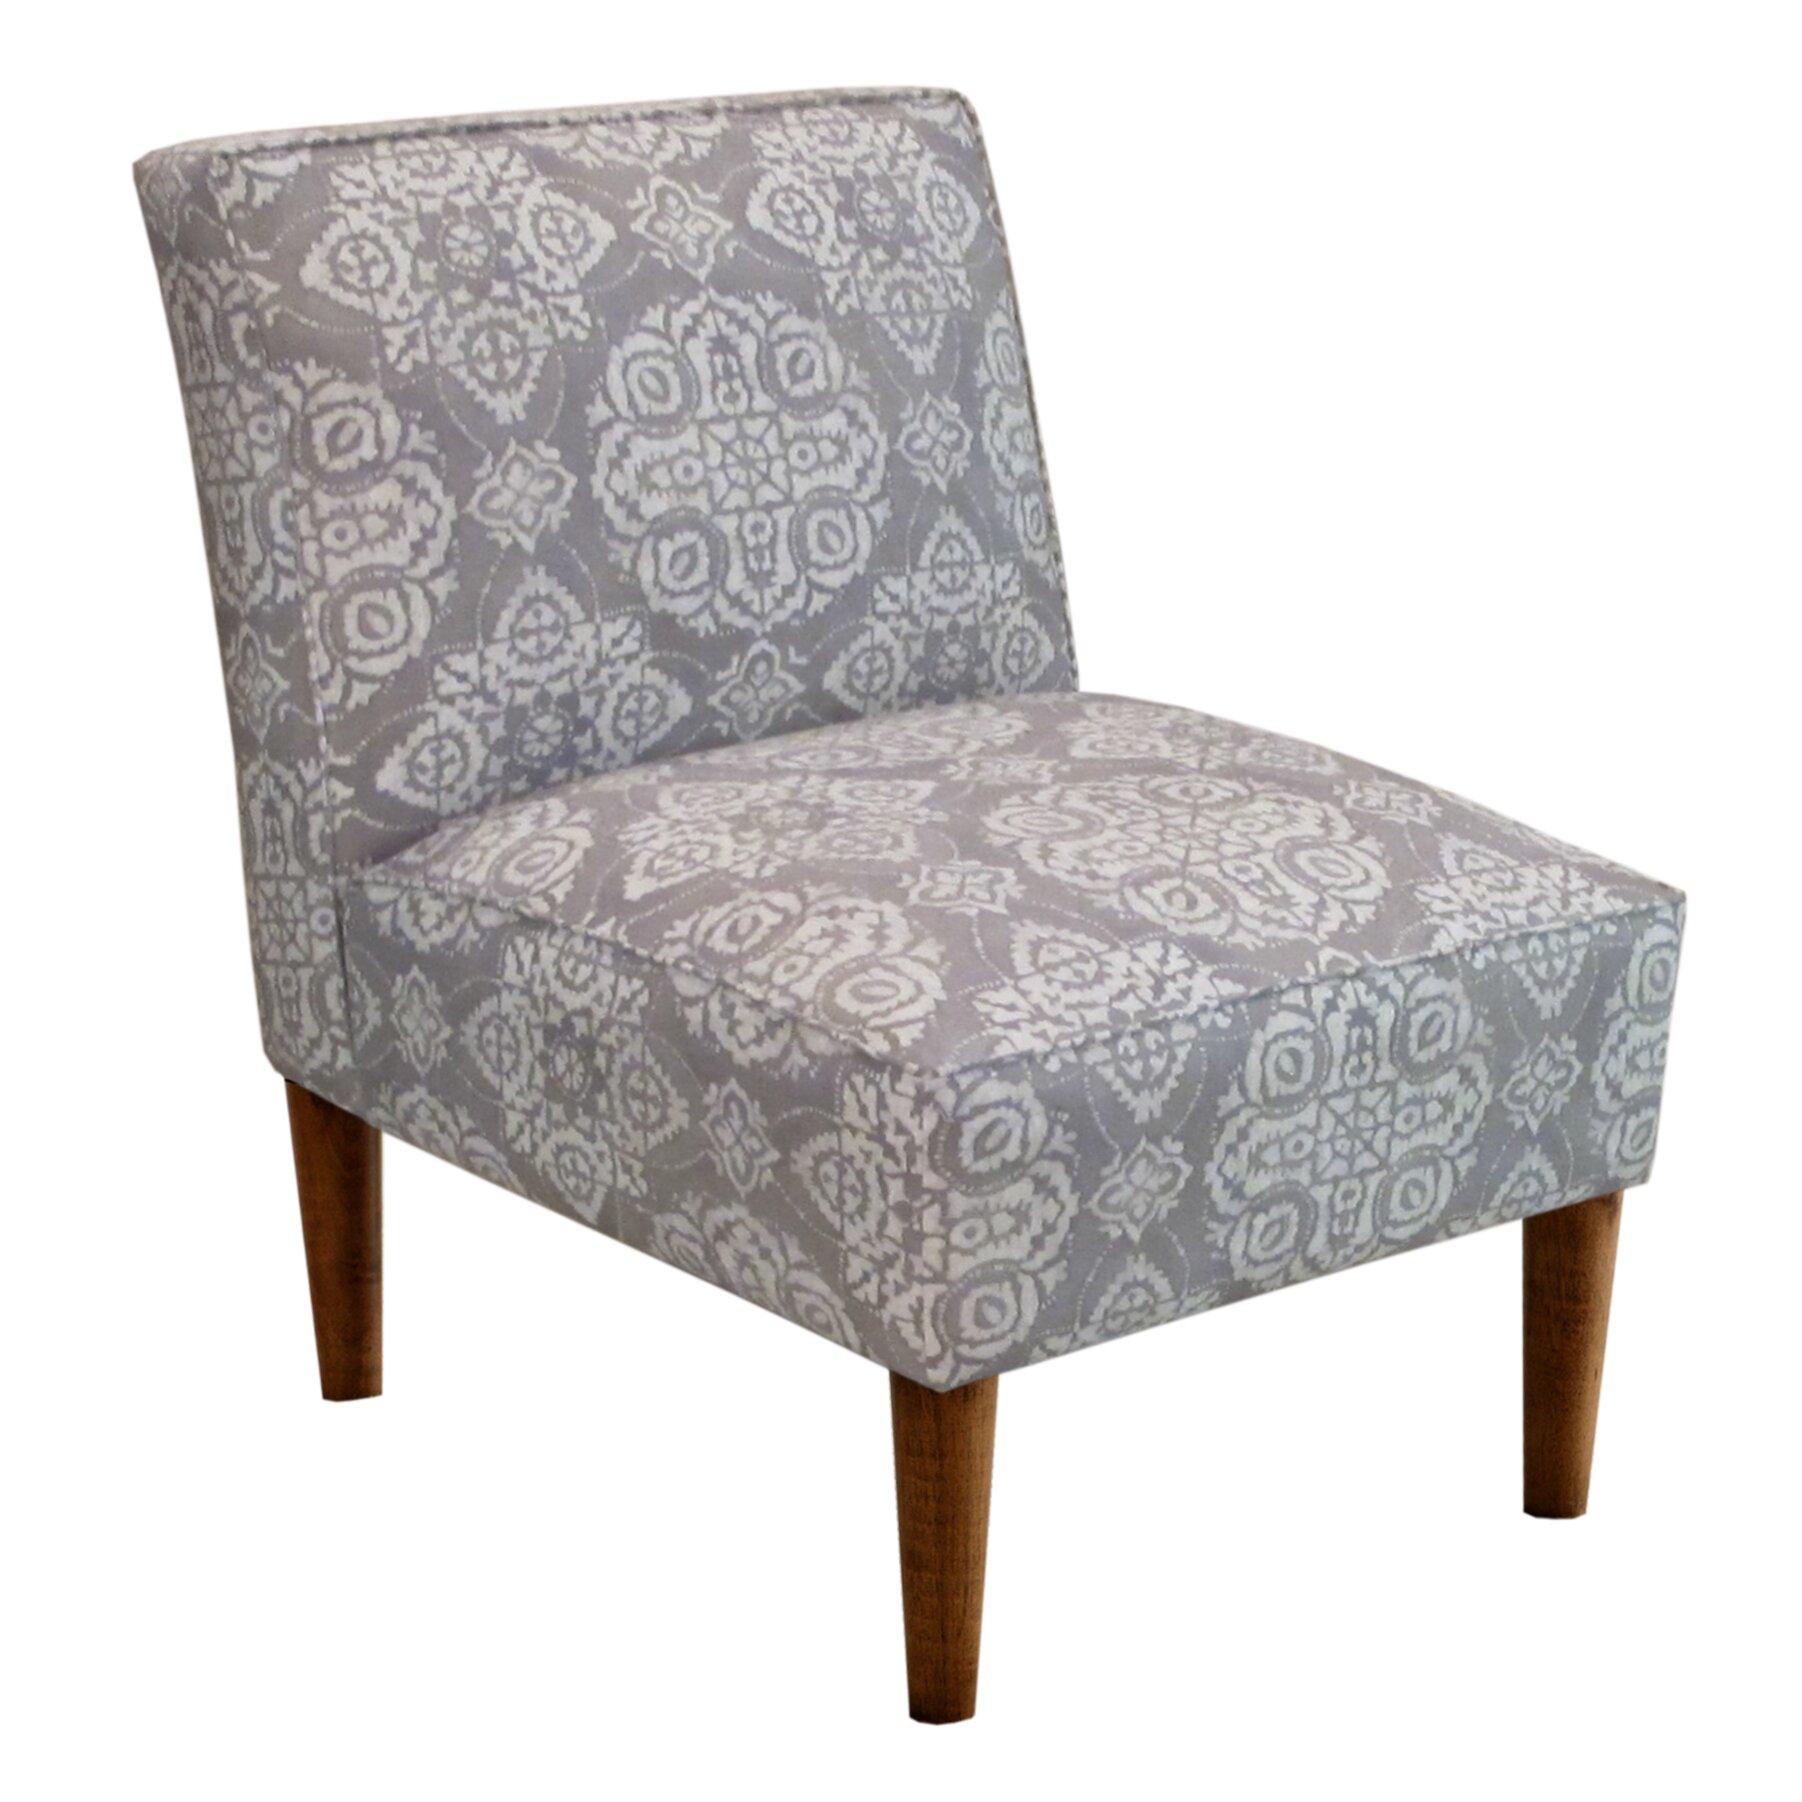 Skyline furniture jakarta fabric armless chair reviews for Furniture jakarta